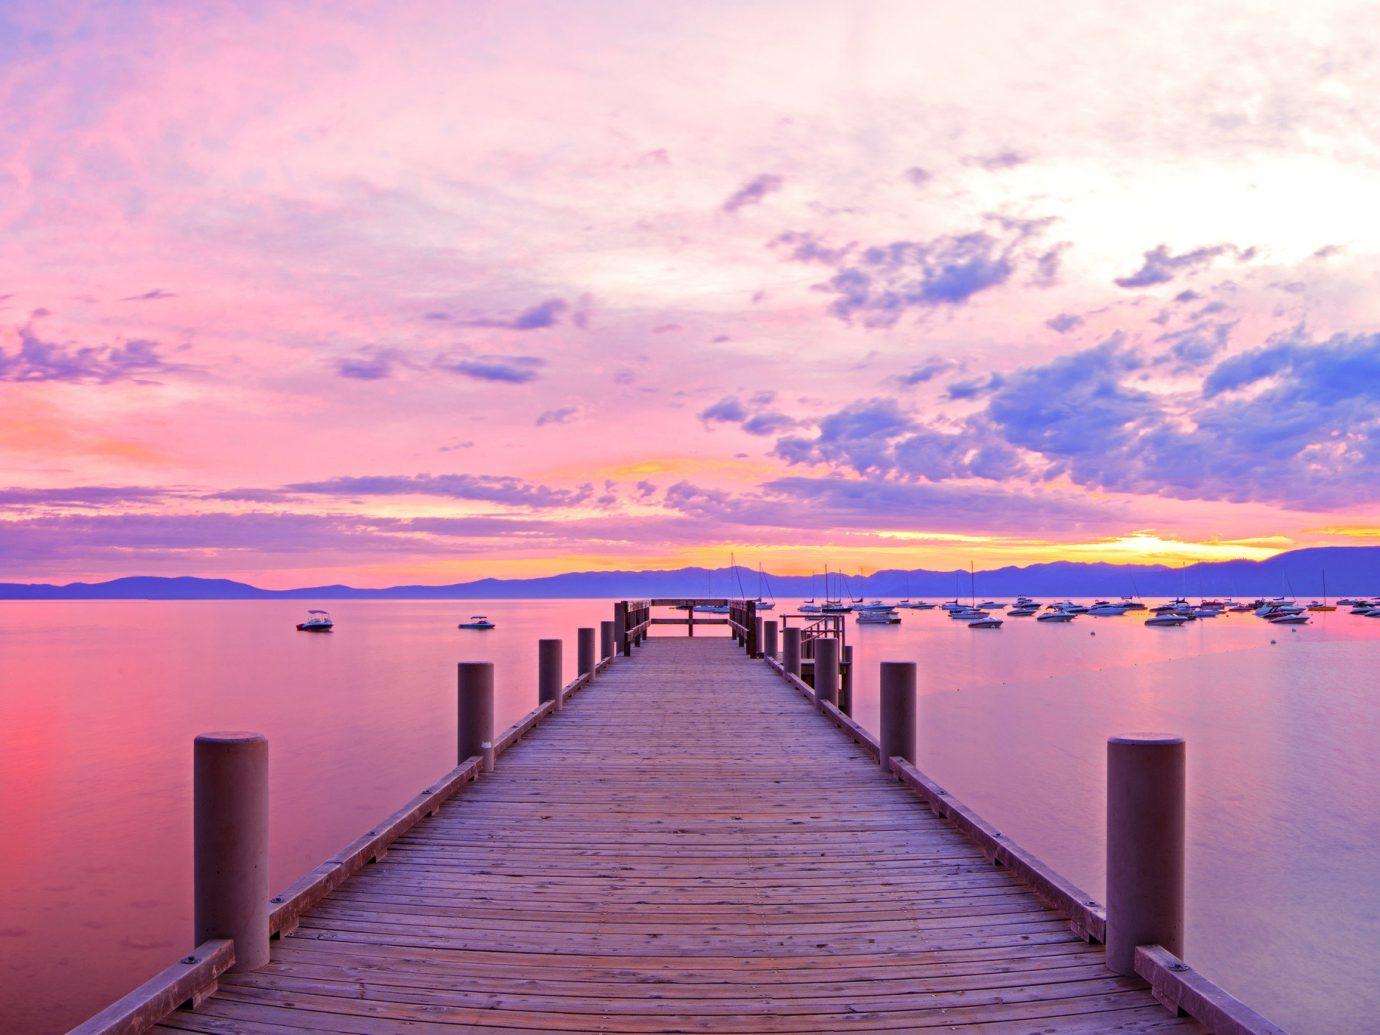 Trip Ideas water scene sky pier outdoor Boat River atmospheric phenomenon horizon dawn sunrise cloud reflection afterglow morning Lake Sunset dusk evening Sea dock shore distance